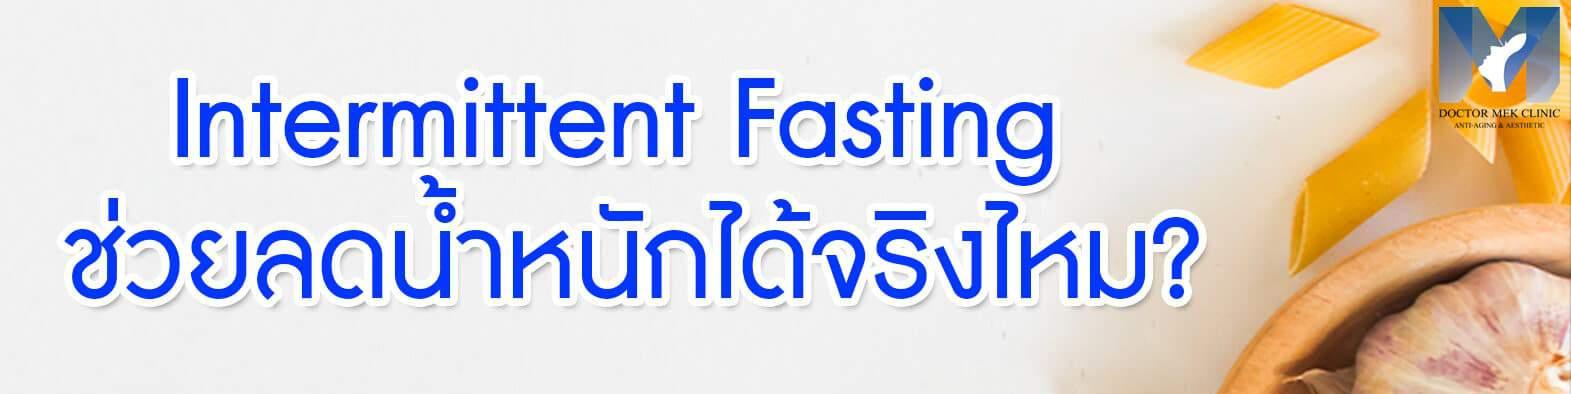 Intermittent Fasting ช่วยลดน้ำหนักได้จริงไหม